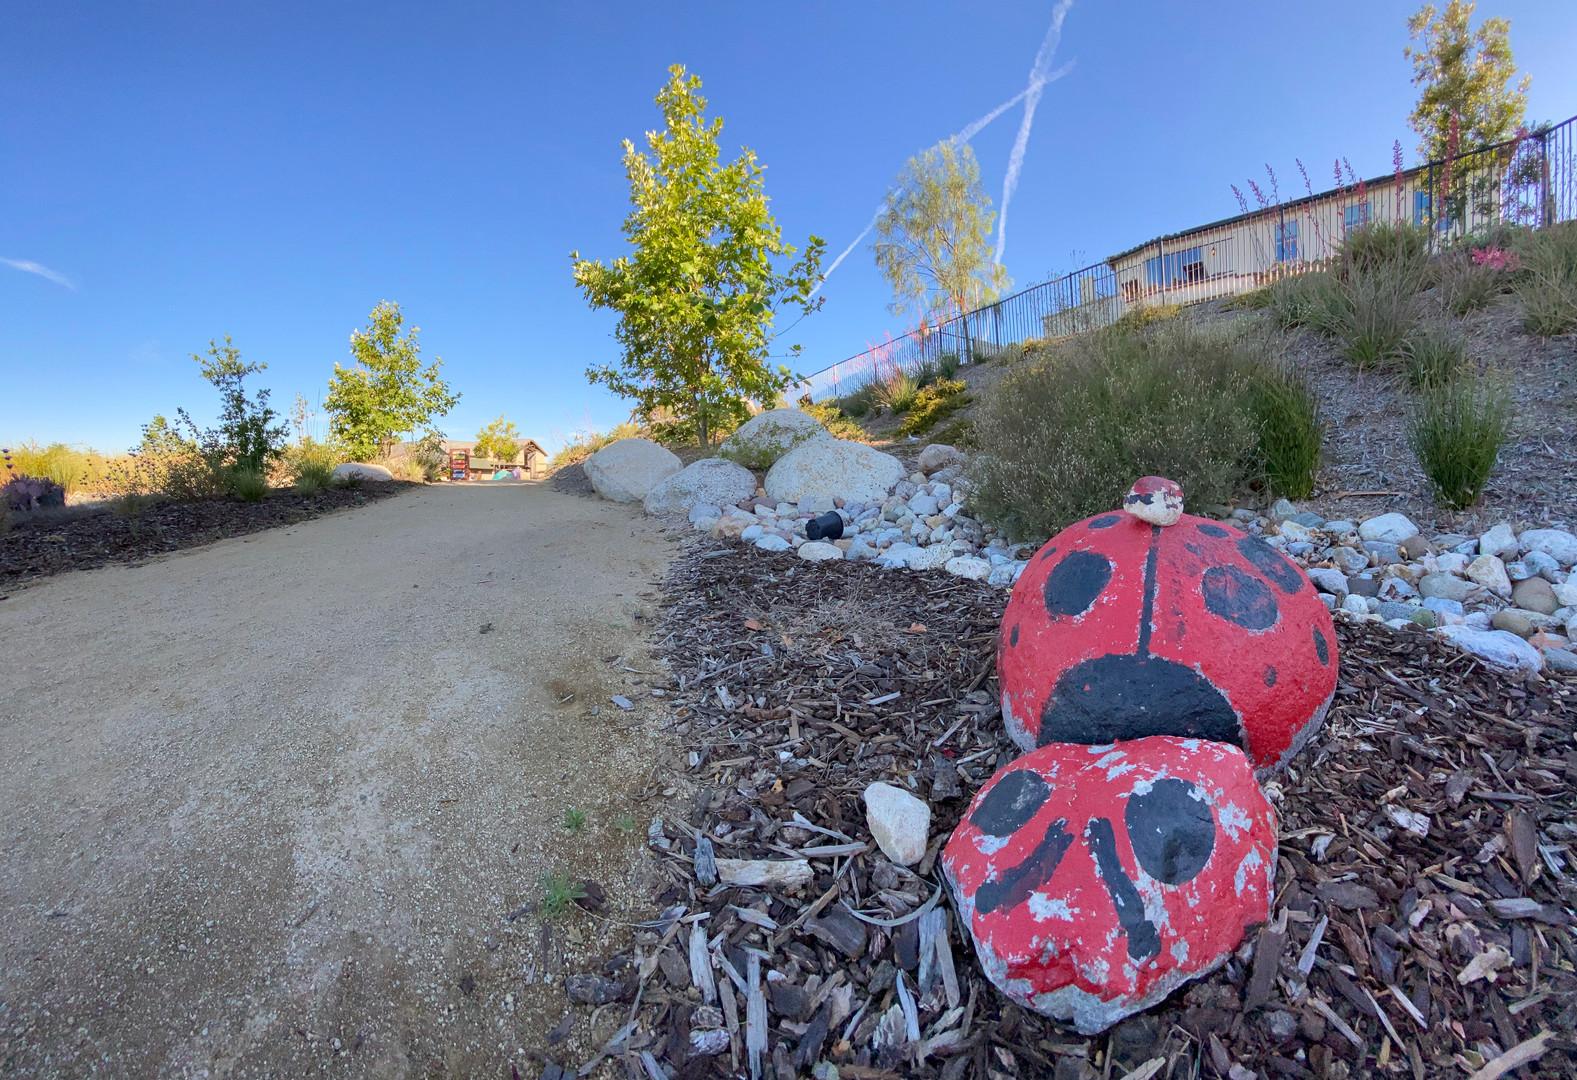 Ladybug boulder path design